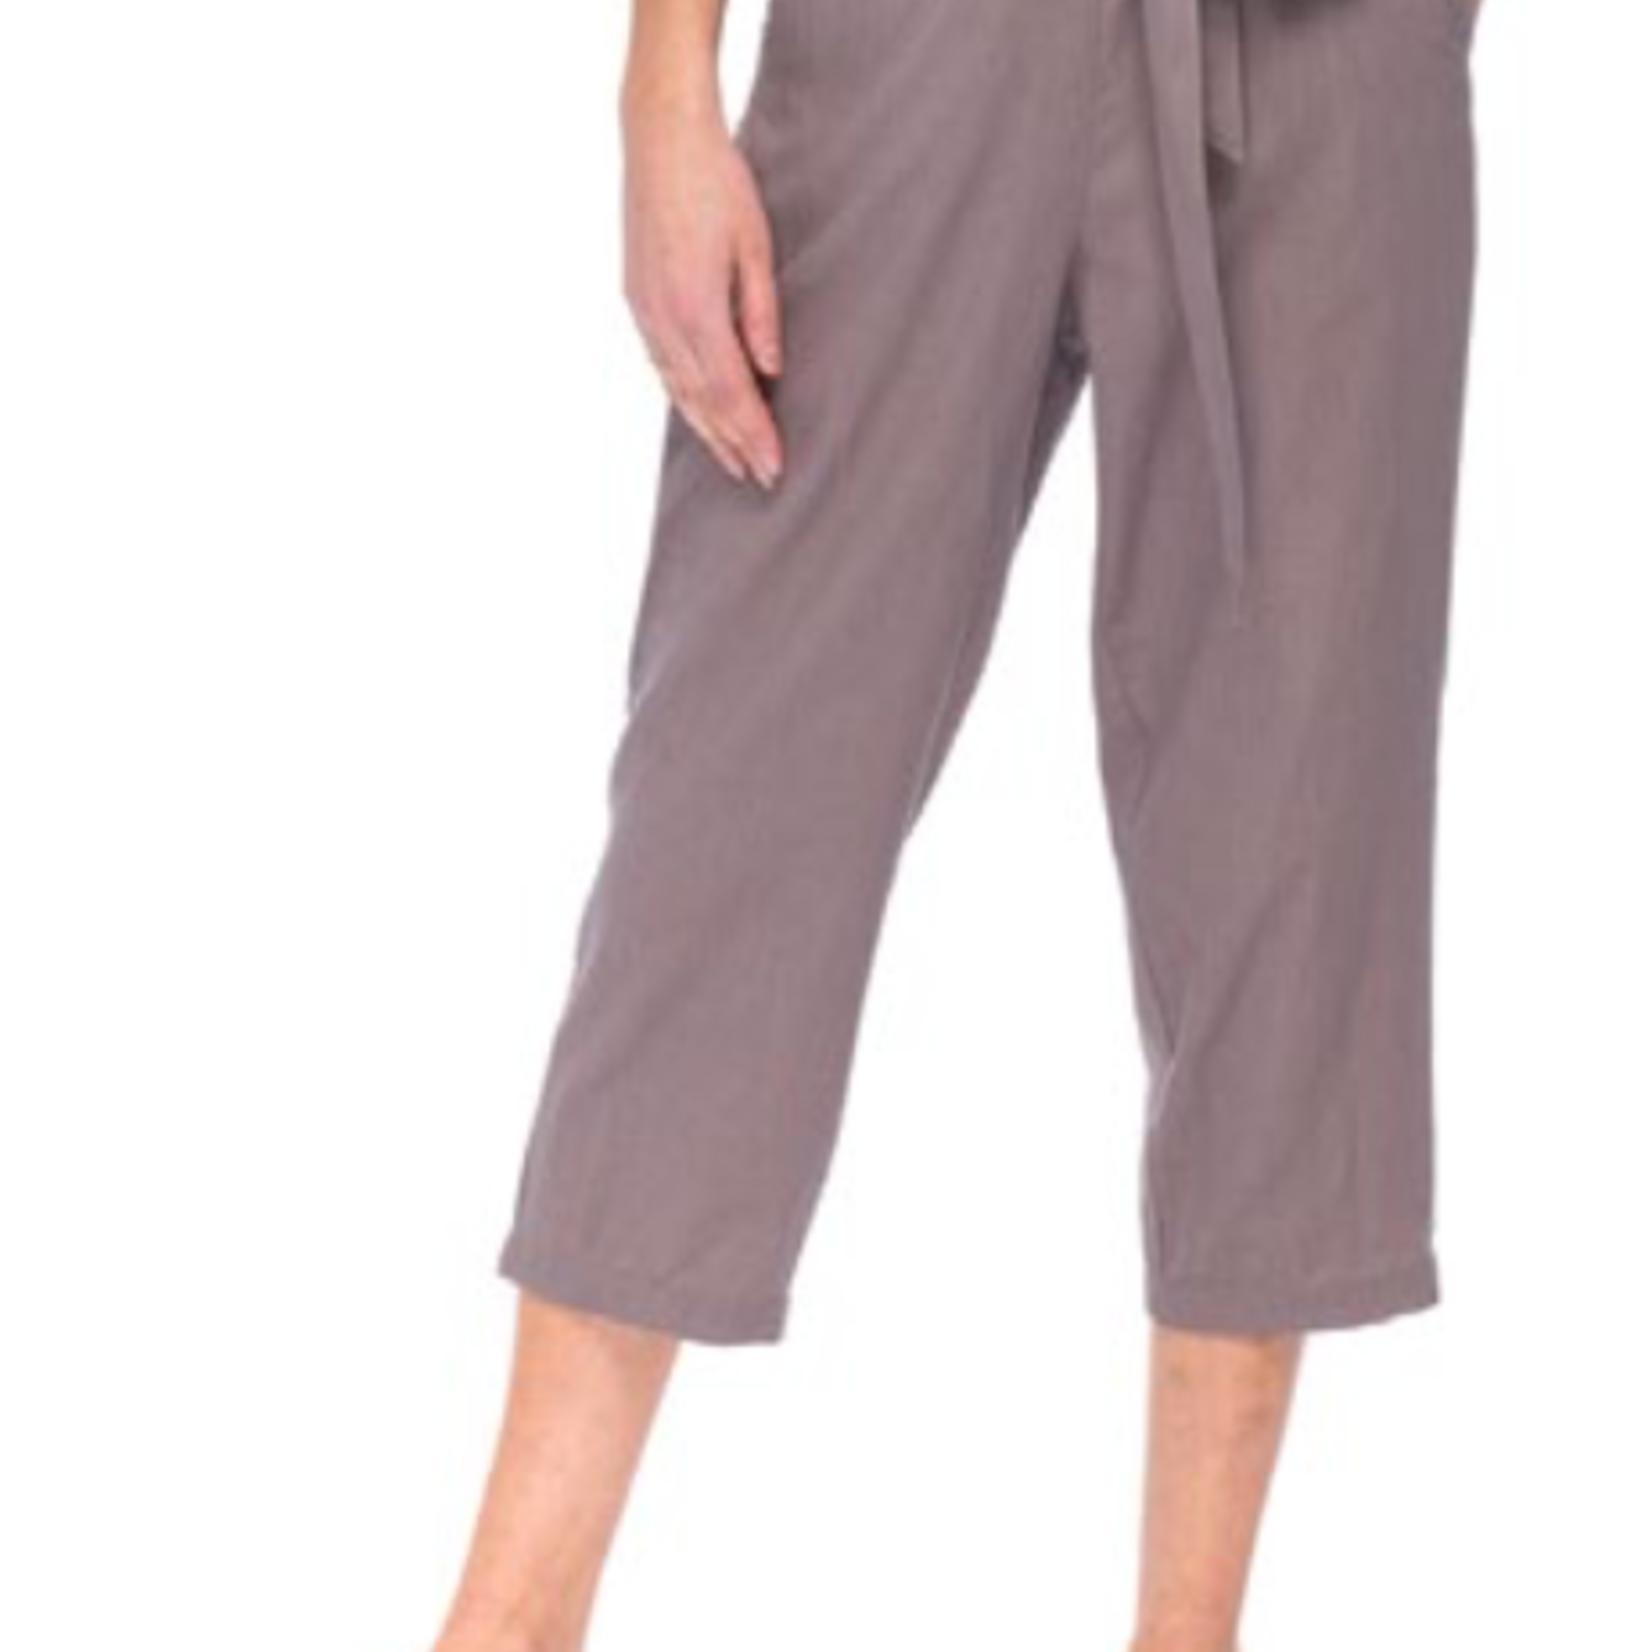 Alchemy Fashions Flax Cotton Pants